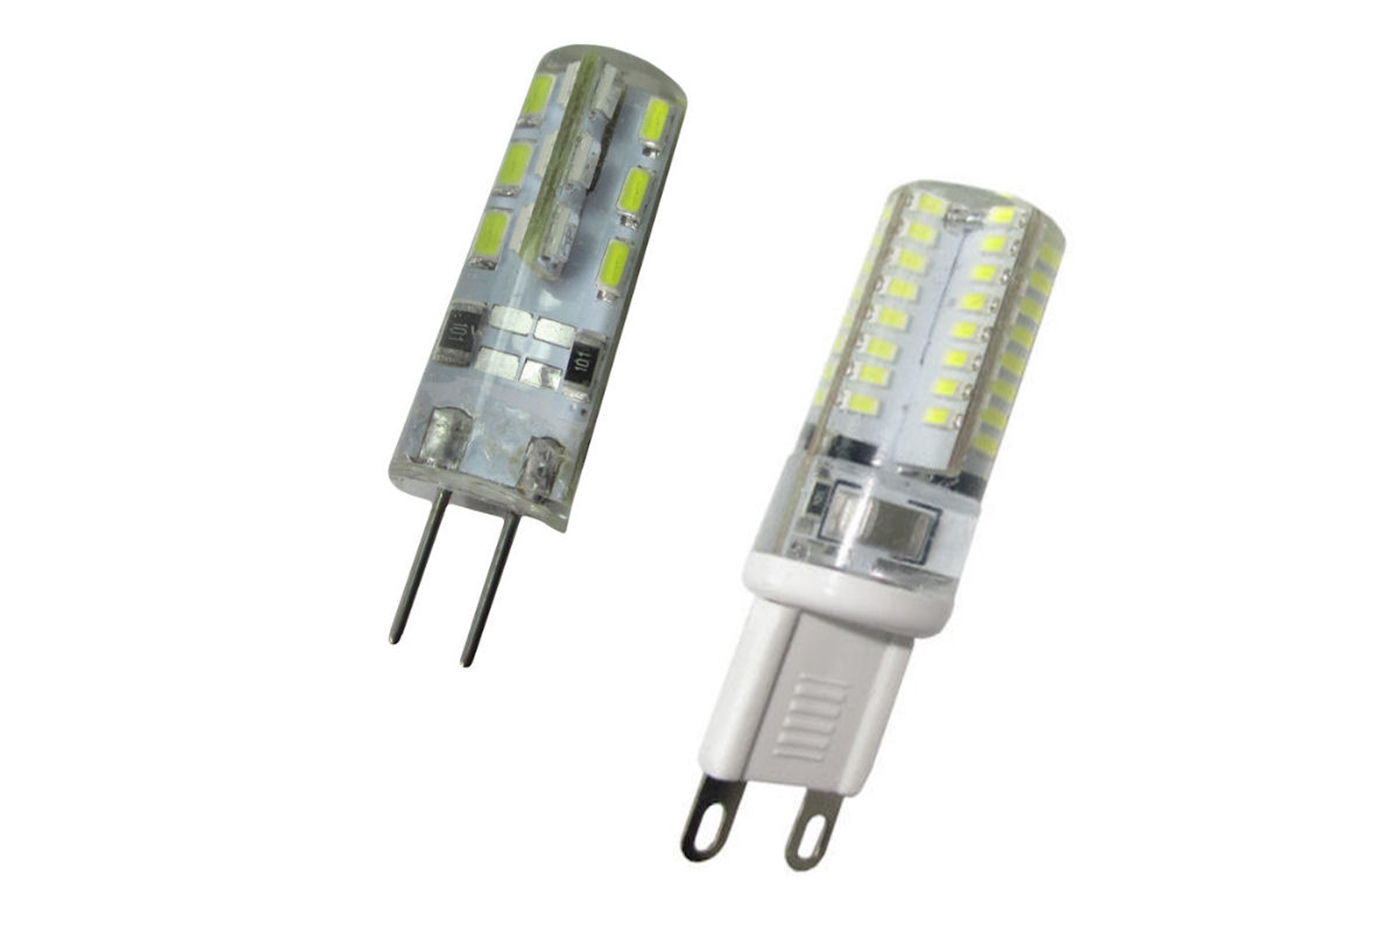 Lampadine Led Attacco G4.Dettagli Su Lampadina Lampada Led Attacco G4 G9 12 220 Volt V Joker Bulk Luce Calda Fredda